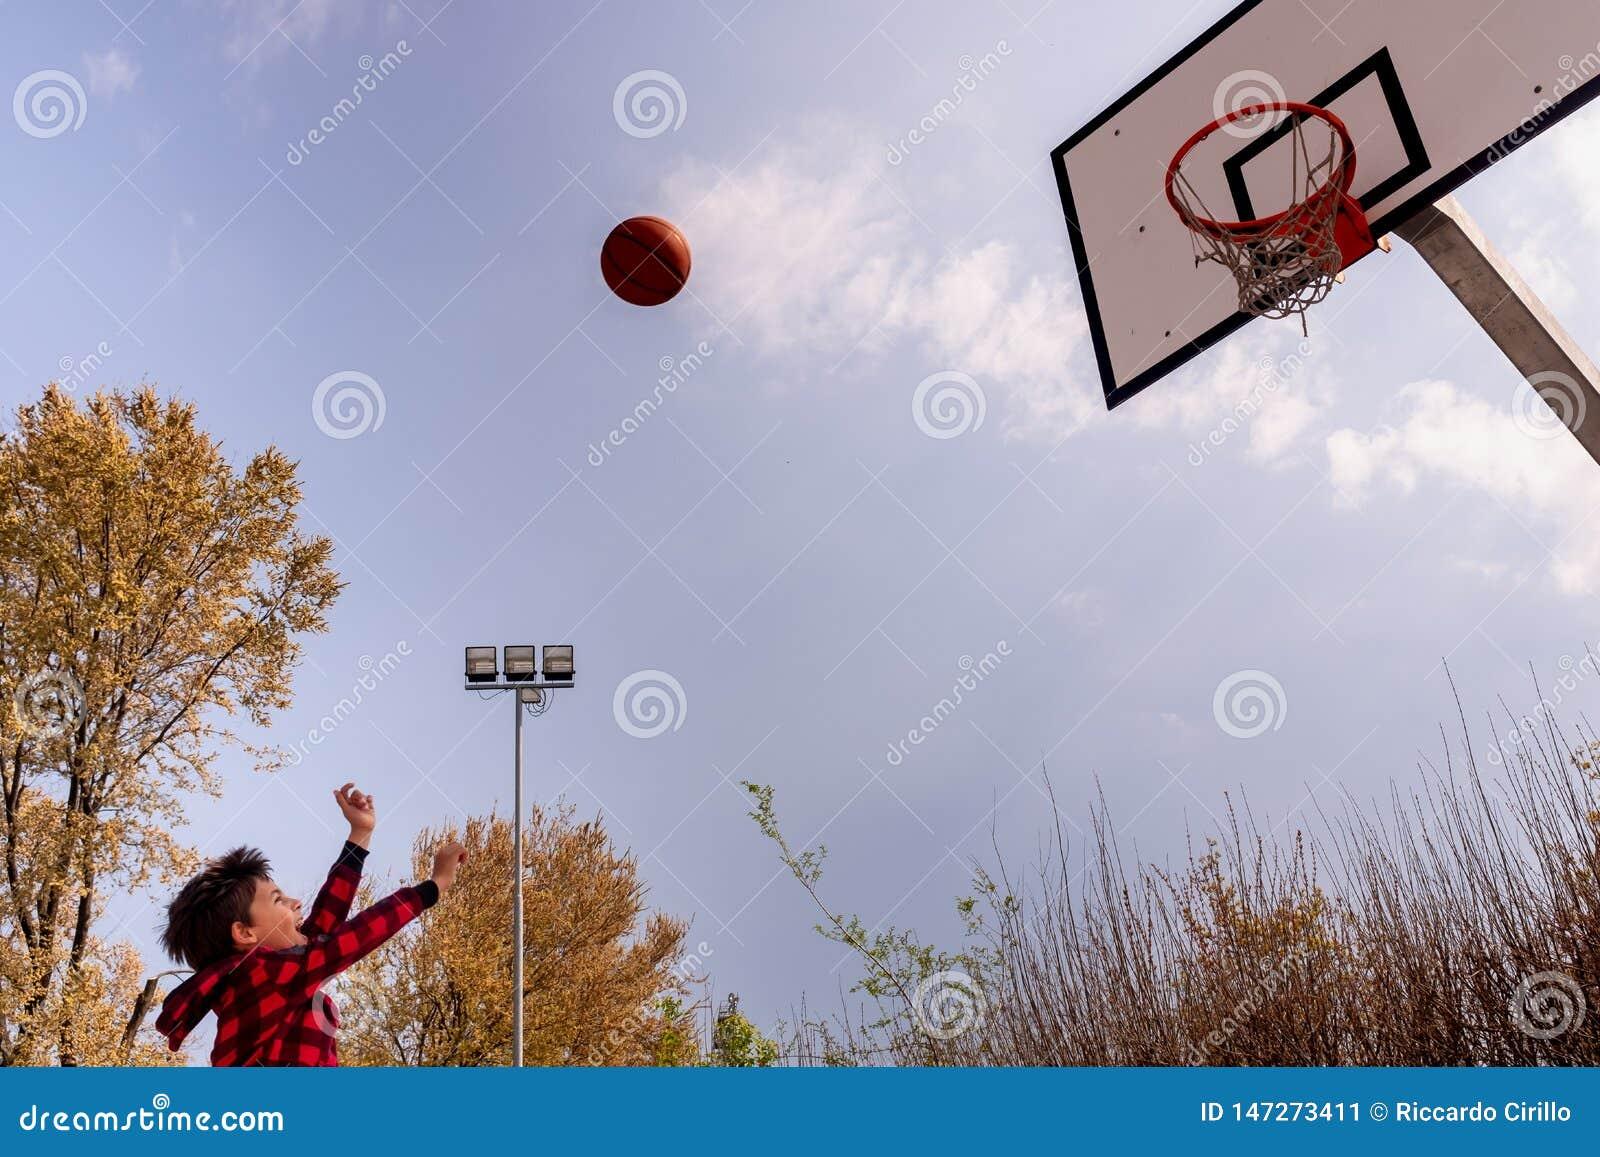 An enthusiastic child makes a basketball shot